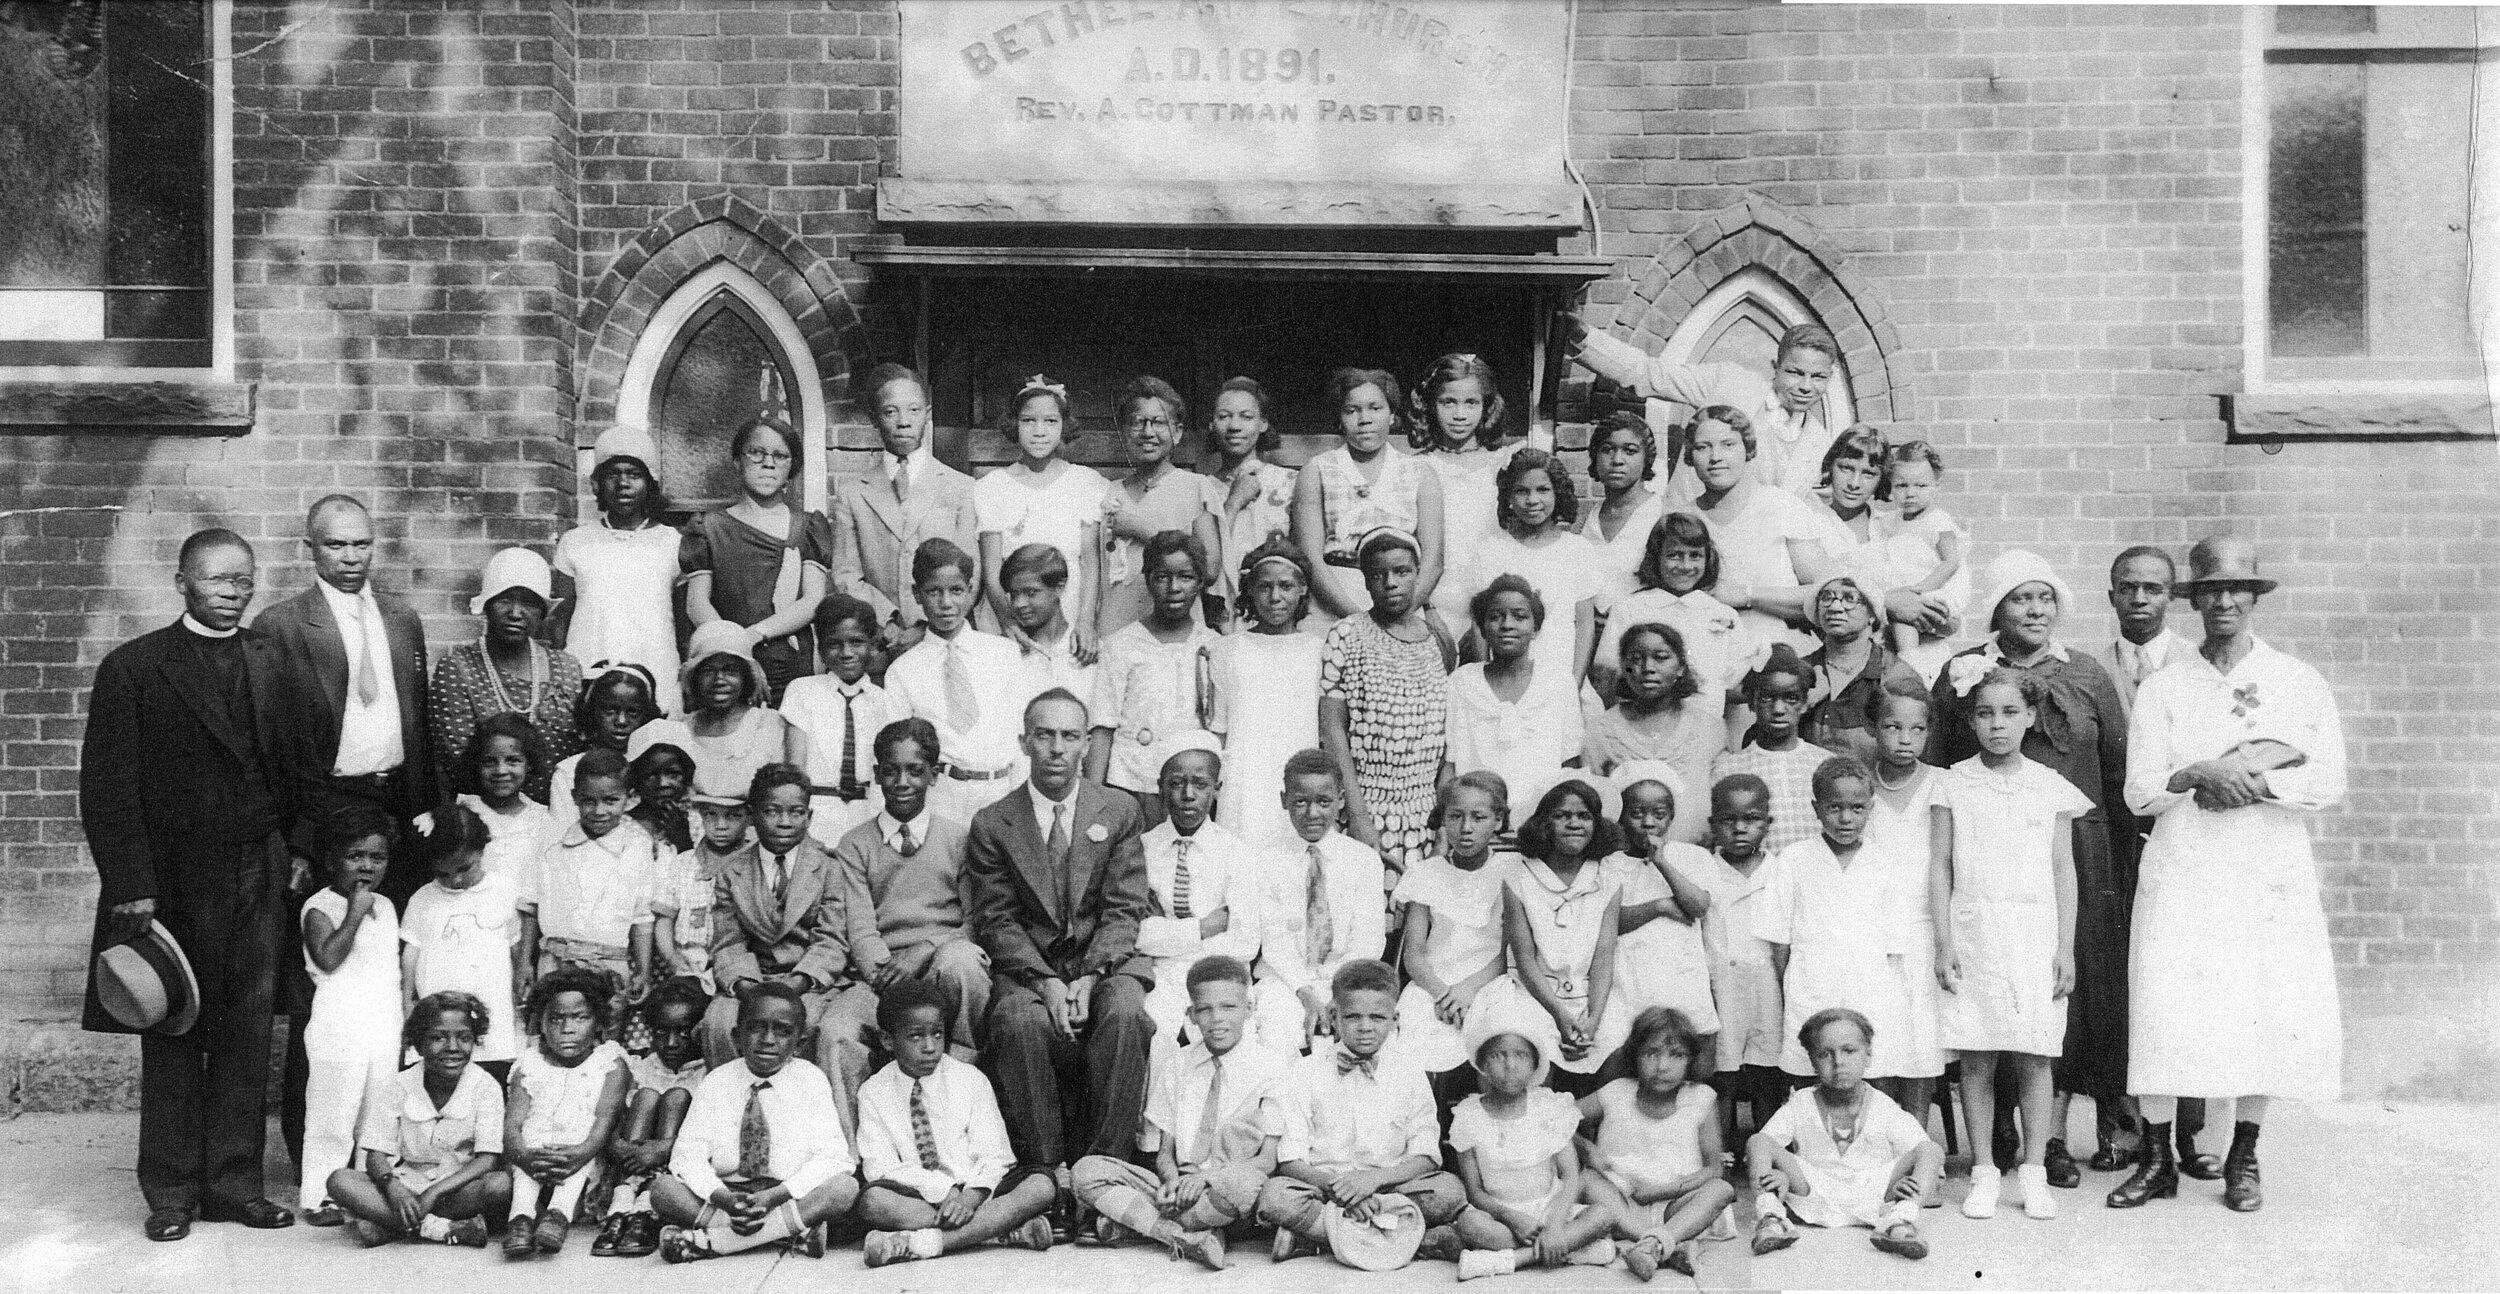 Sunday School at Bethel A.M.E., ca. 1930